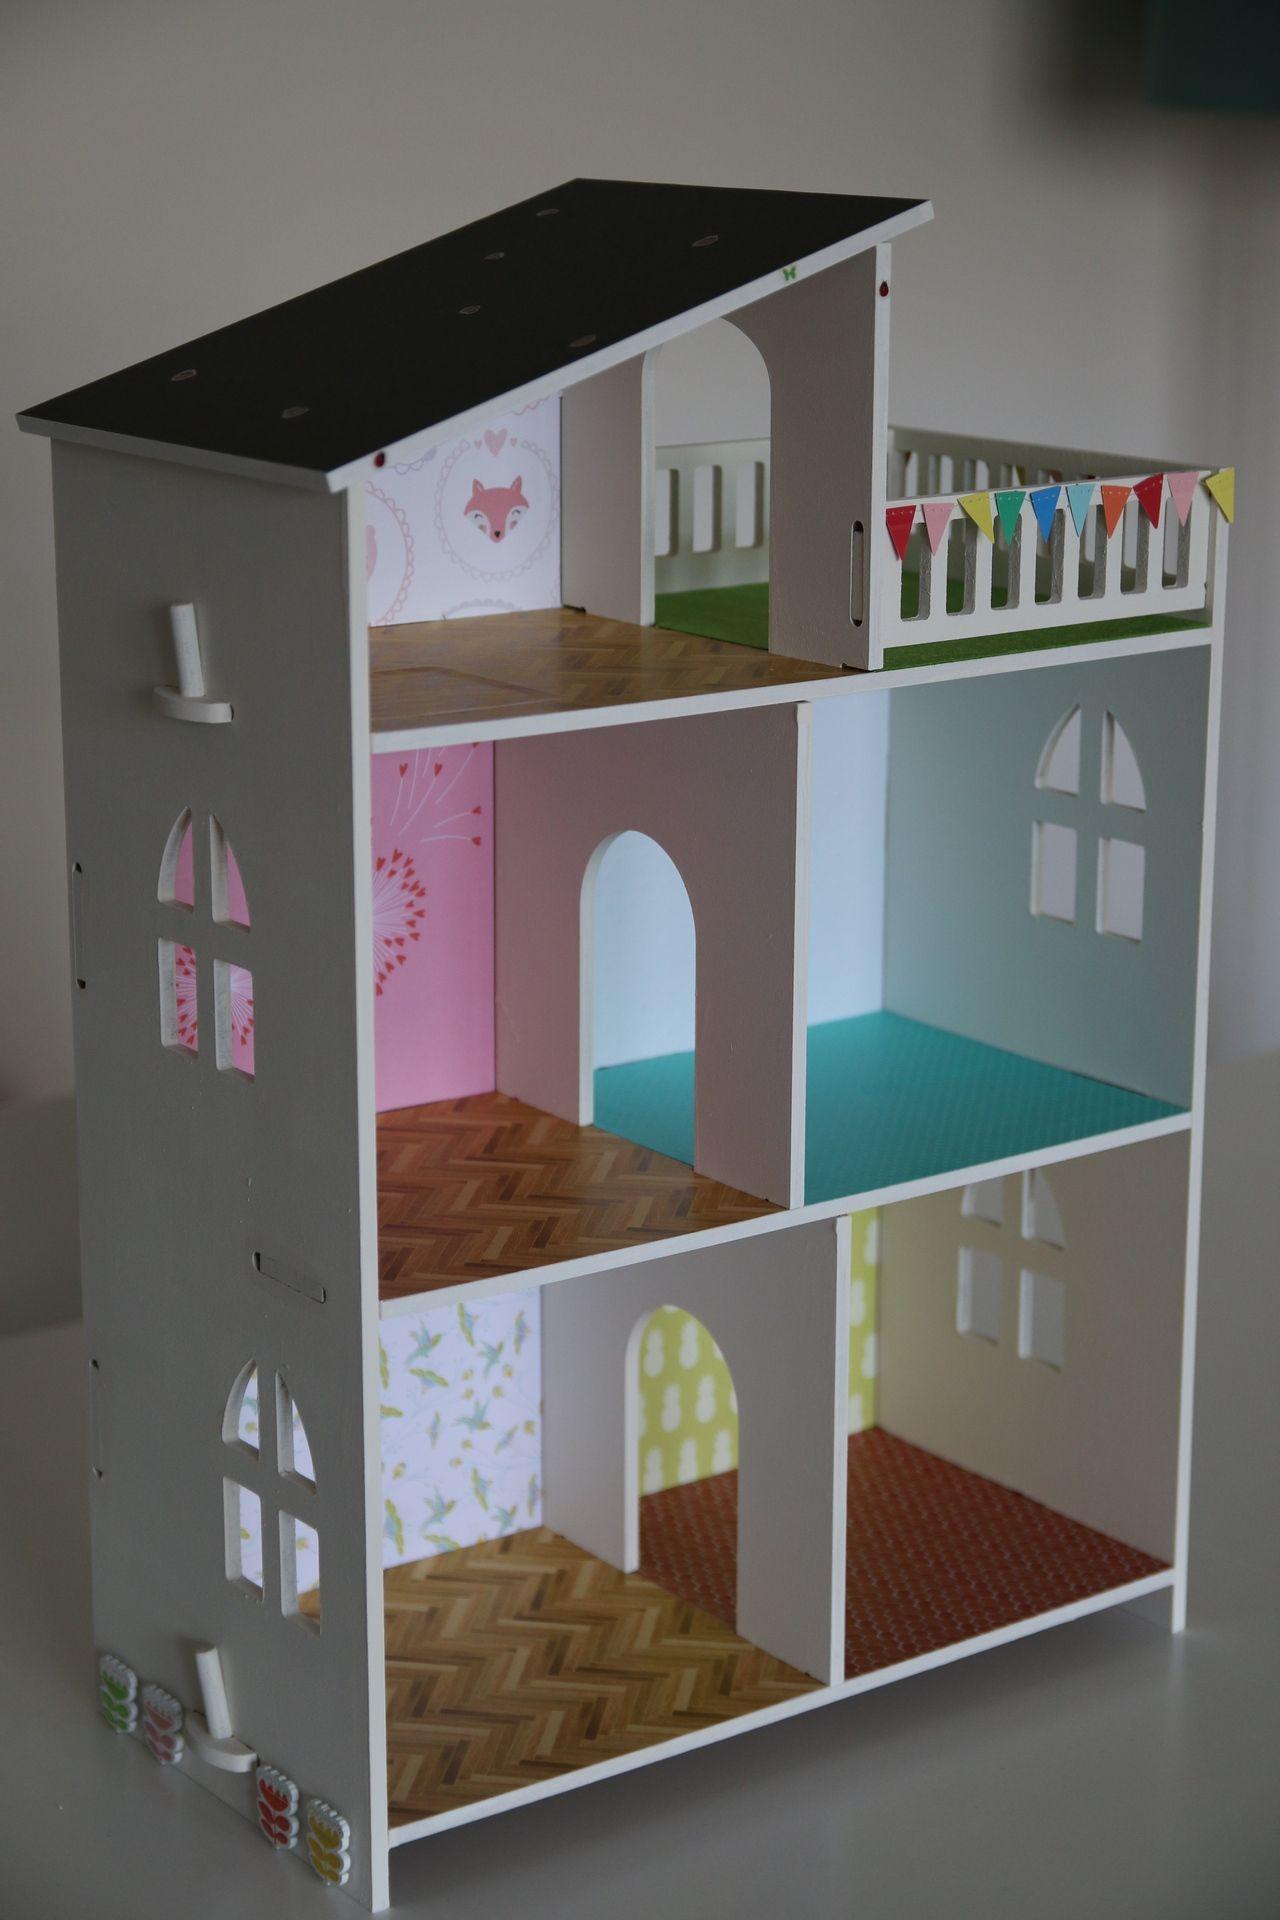 Maison poup es sylvanian playmobil diy tuto id es d co diy maison poup e maison de poup e - Maison en bois playmobil ...